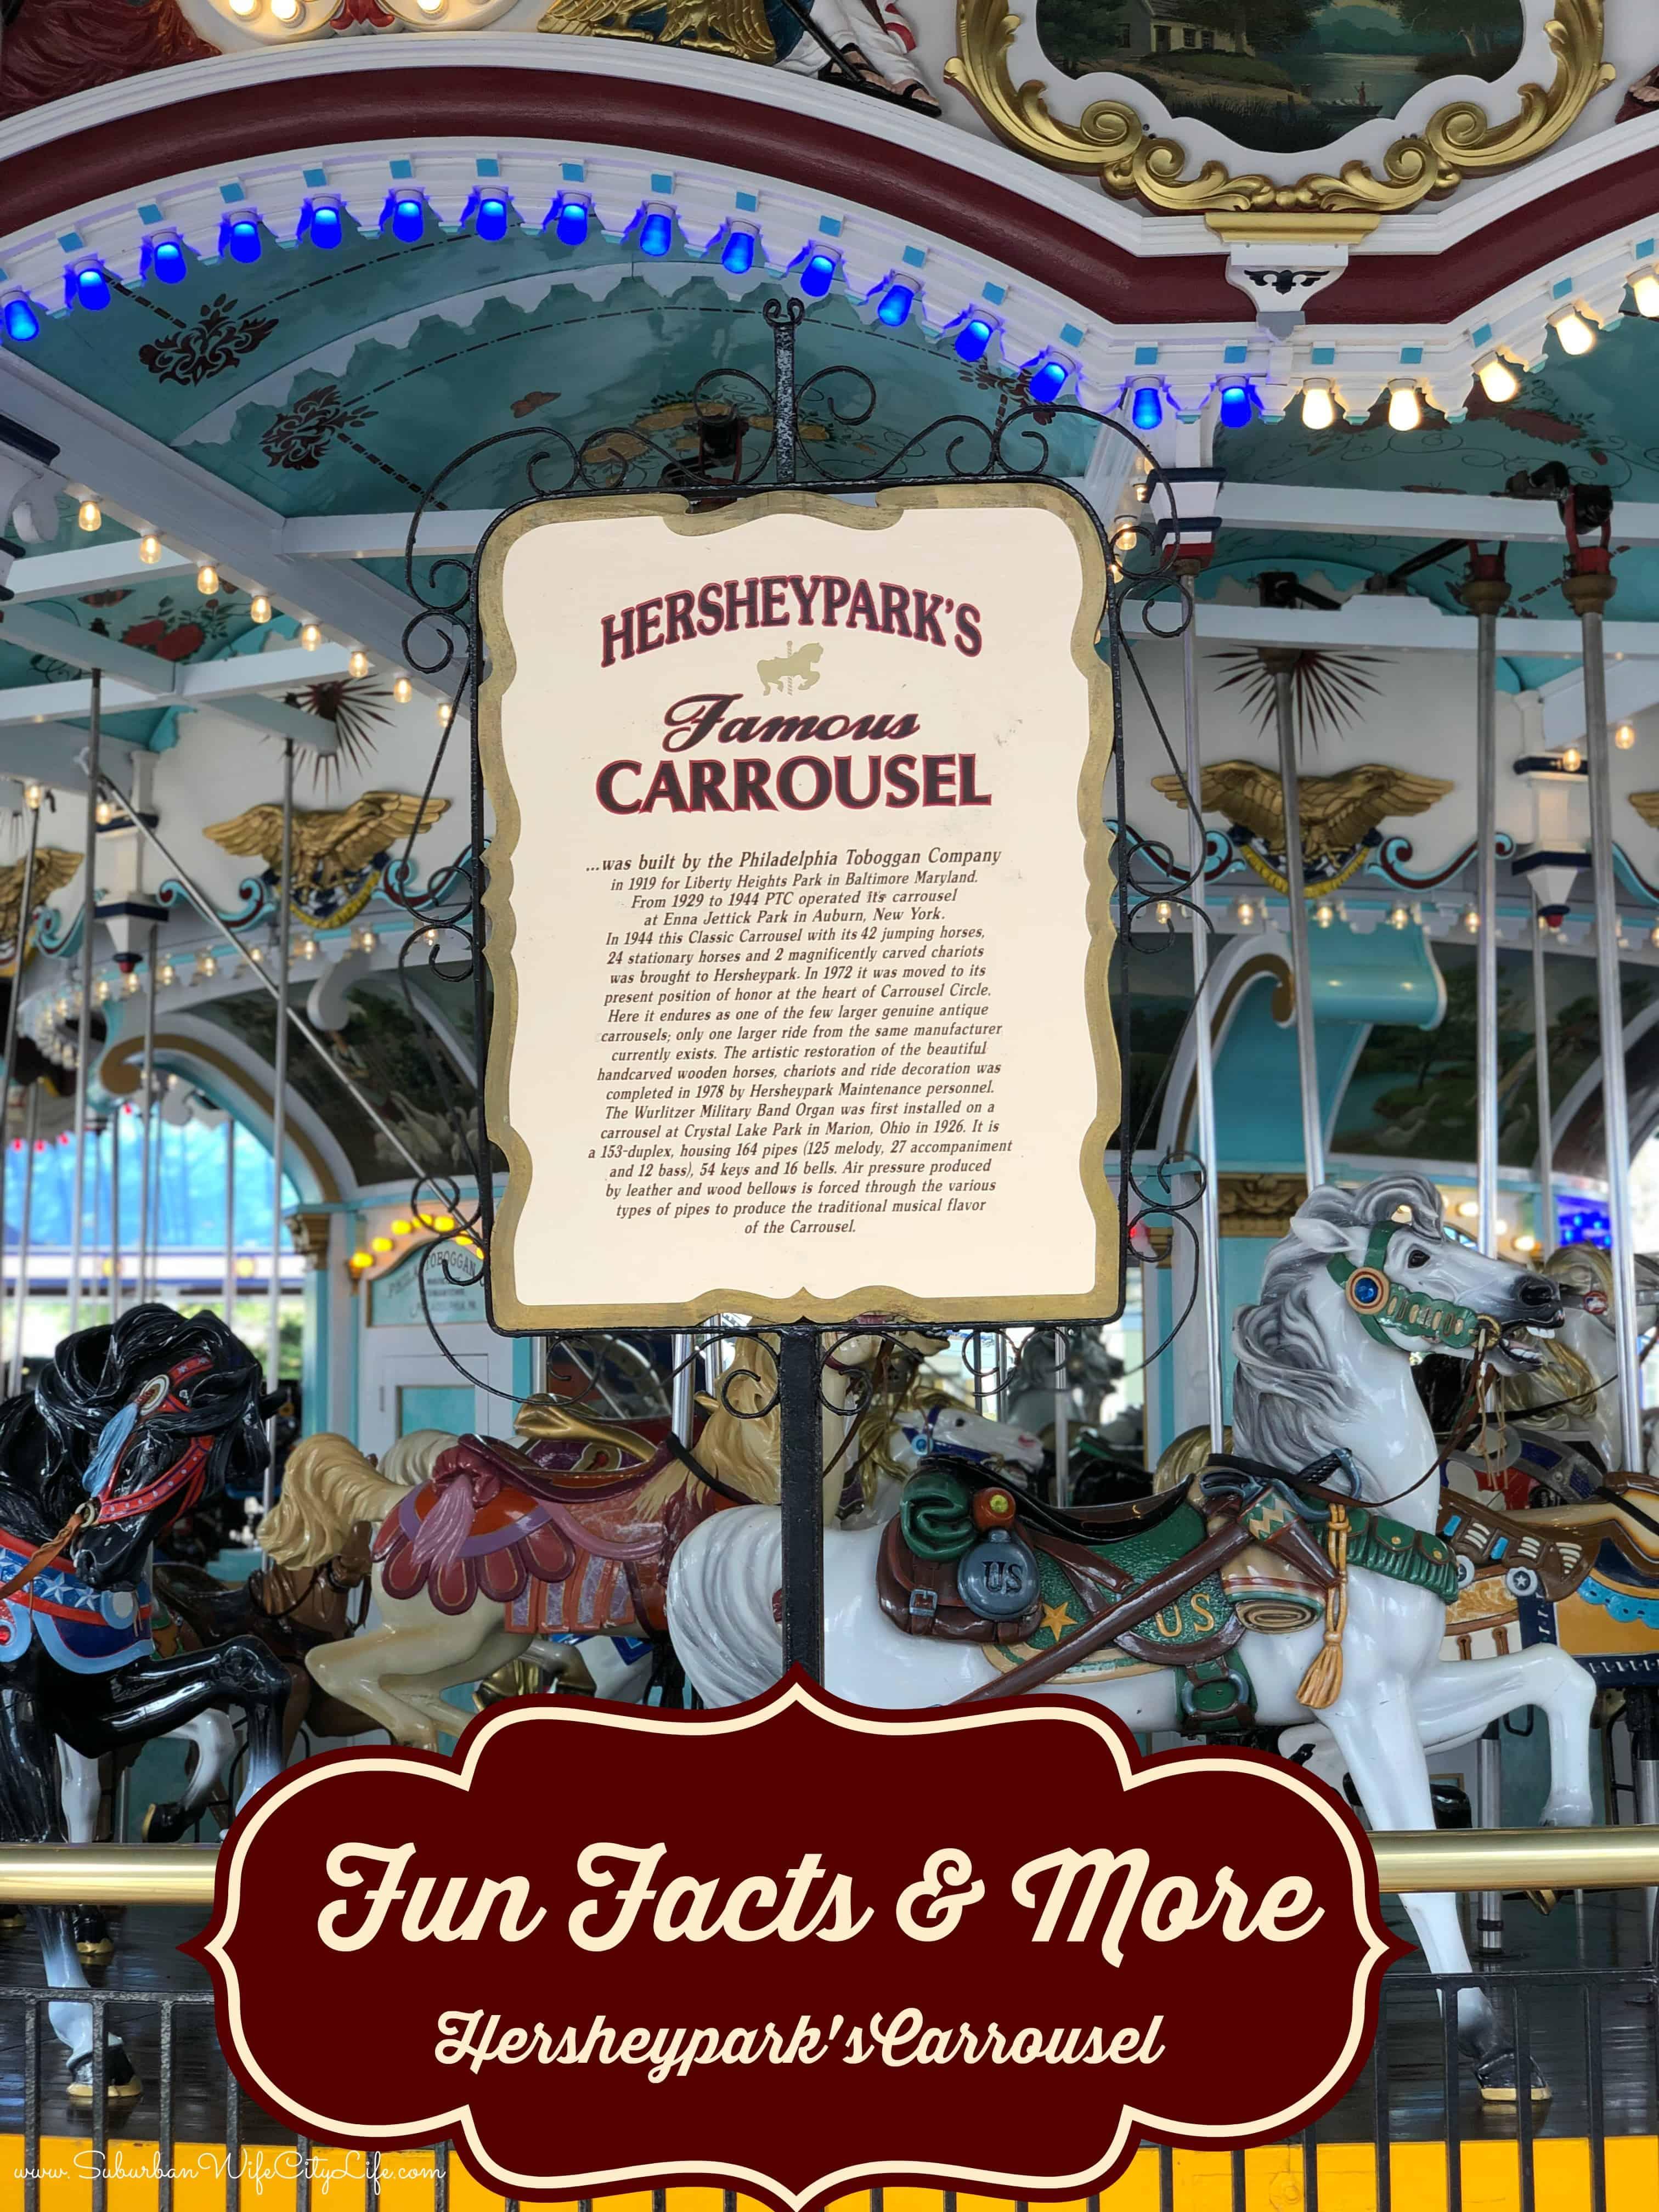 Hersheypark Carrousel